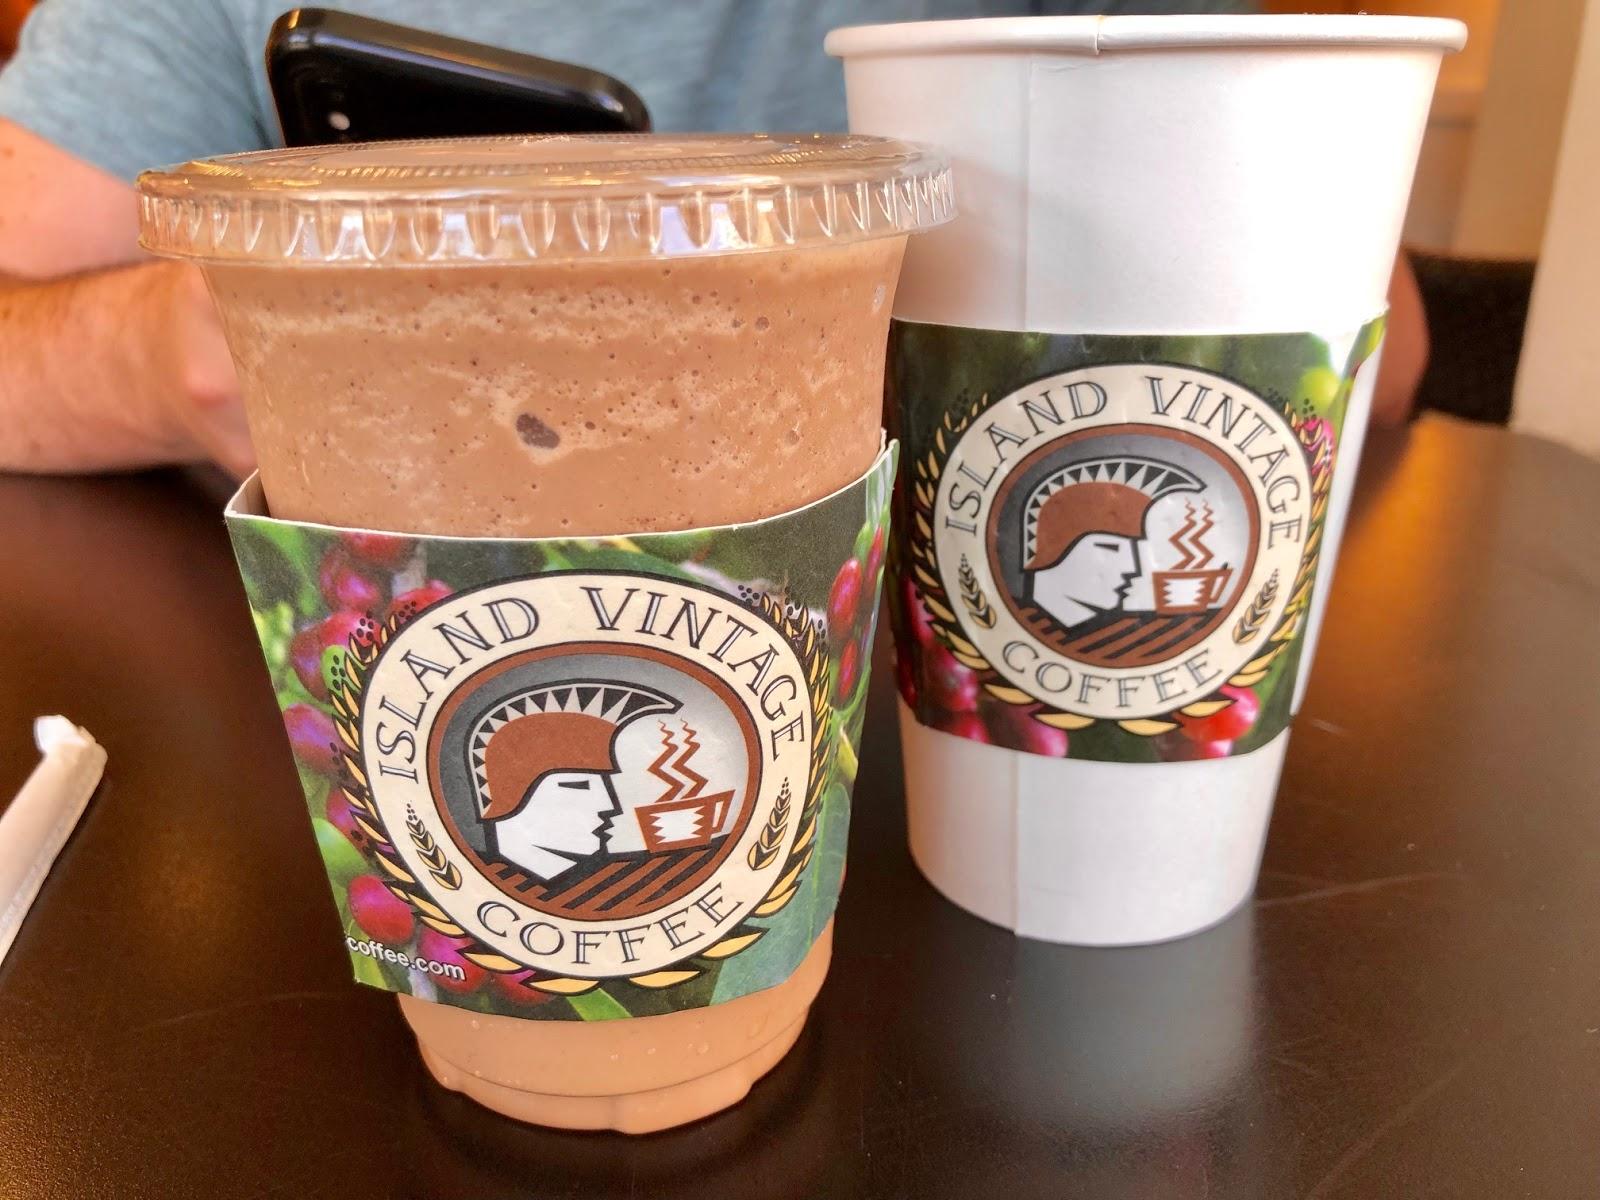 Island Vintage Coffee Maui Review